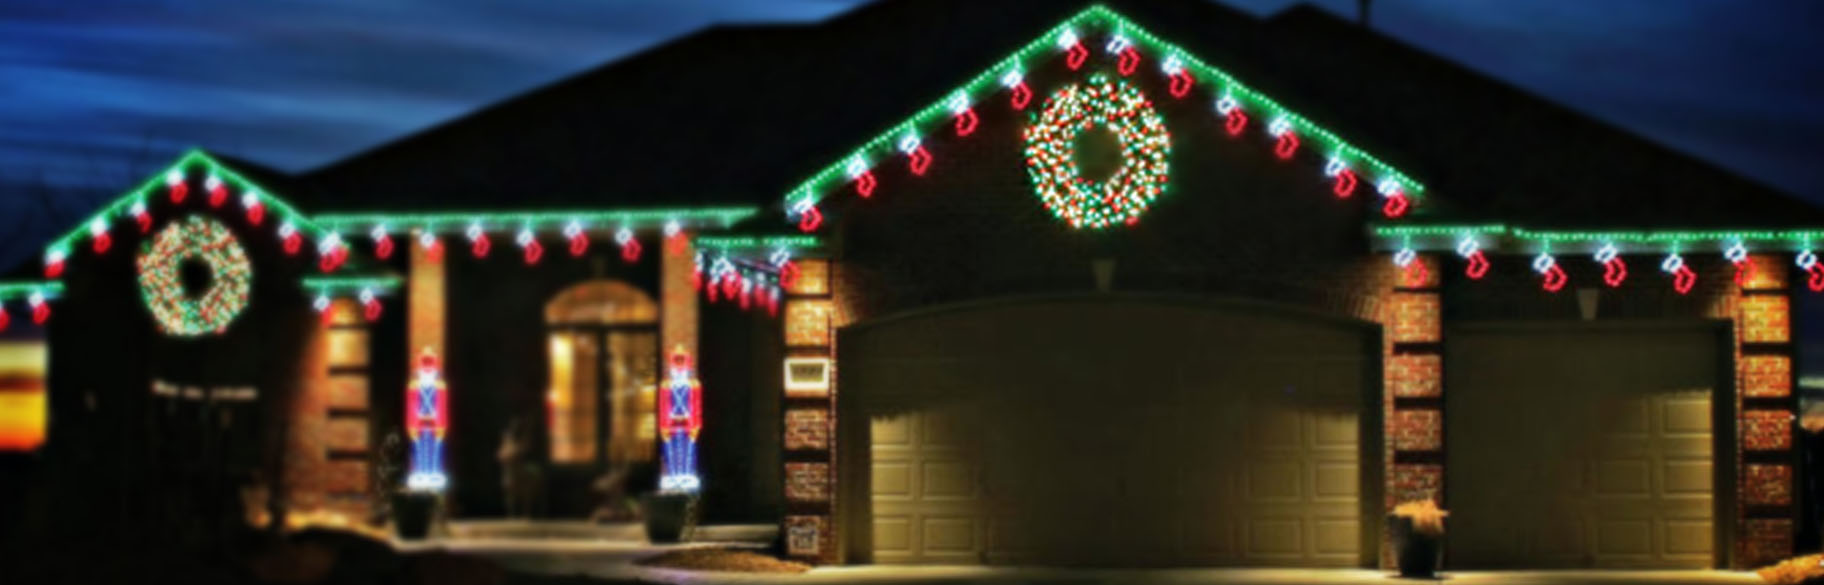 Holiday Lighting 4